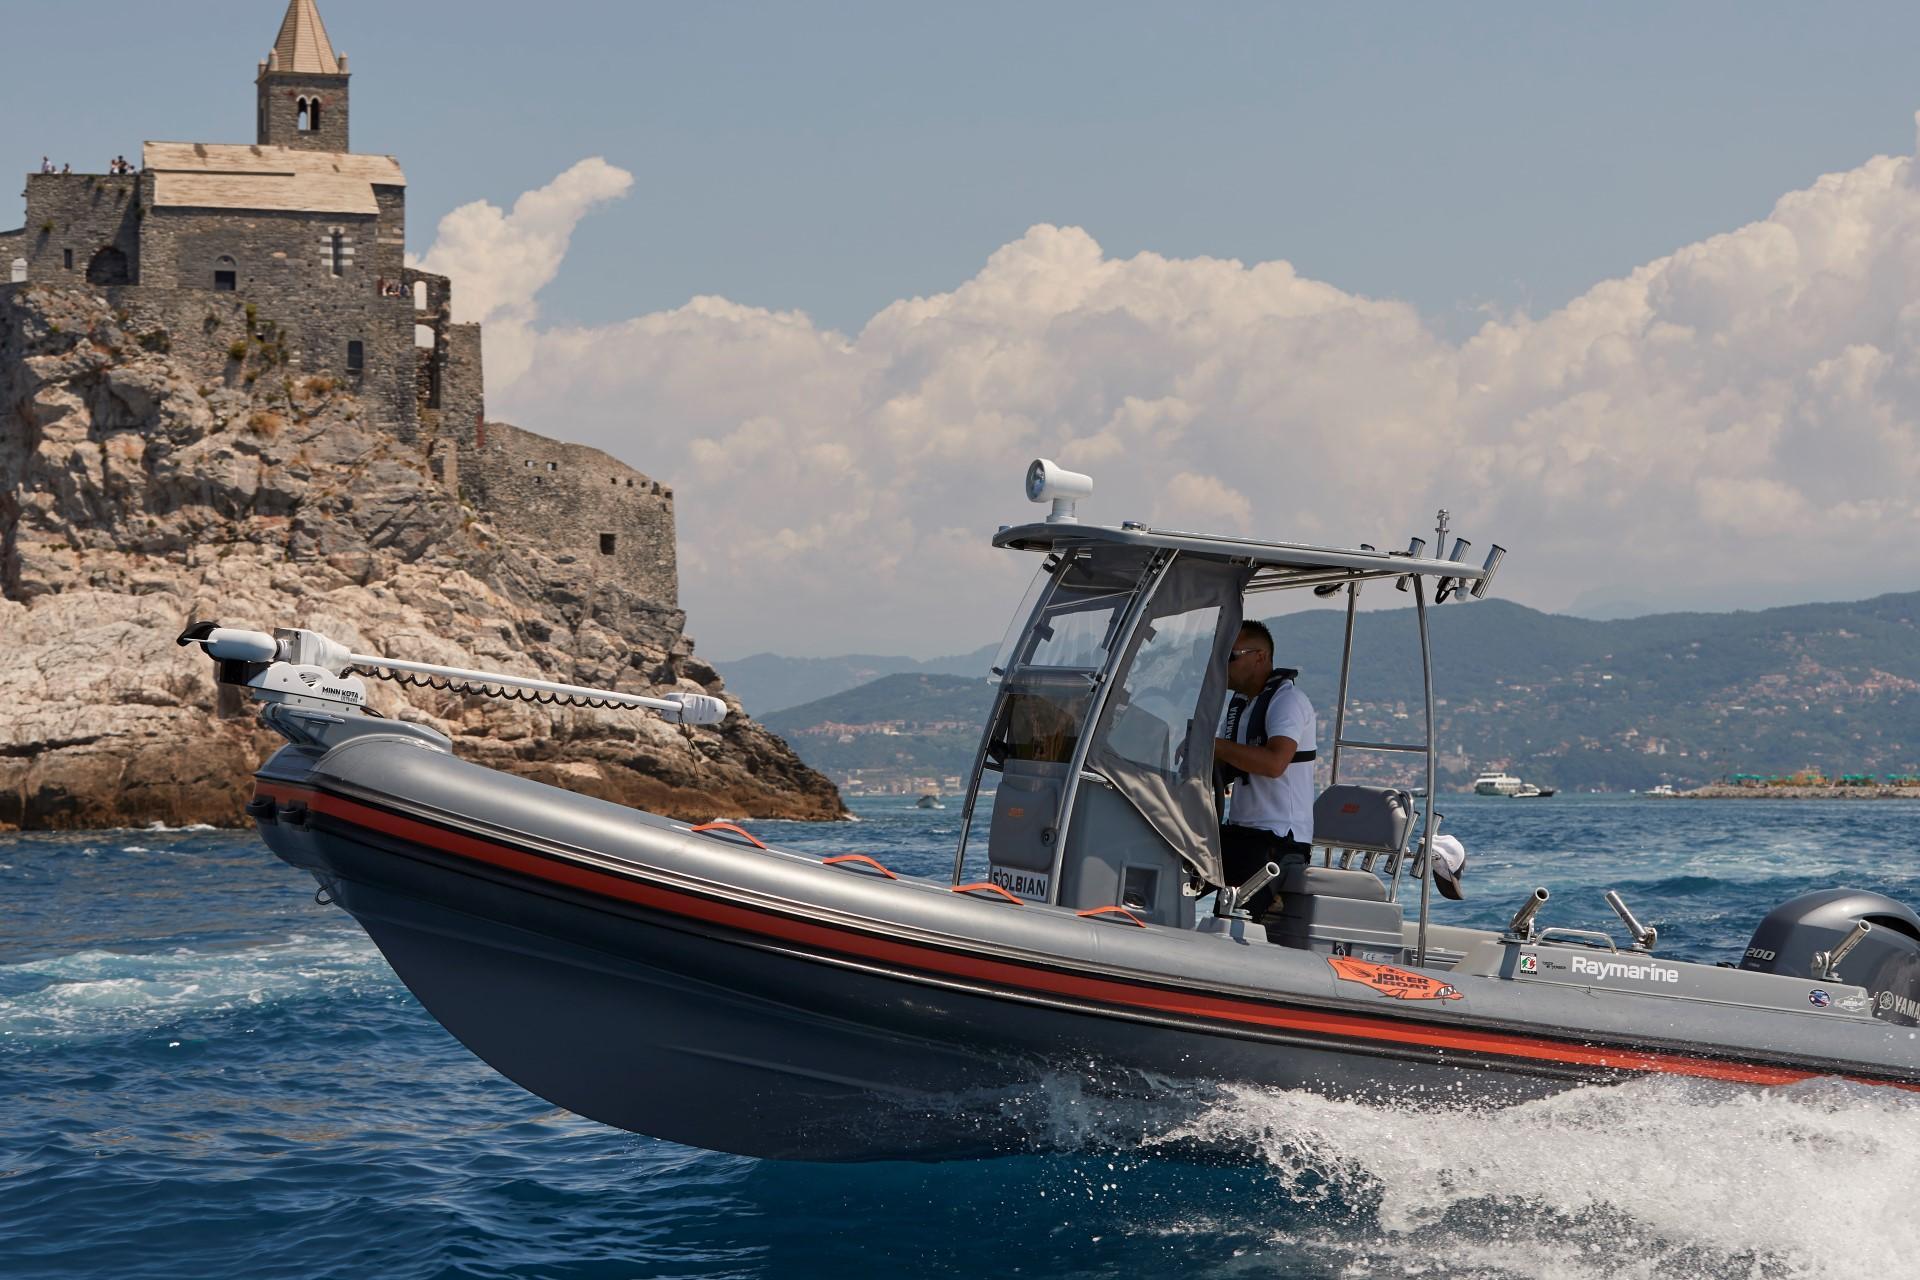 Joker Boat Barracuda minnkota